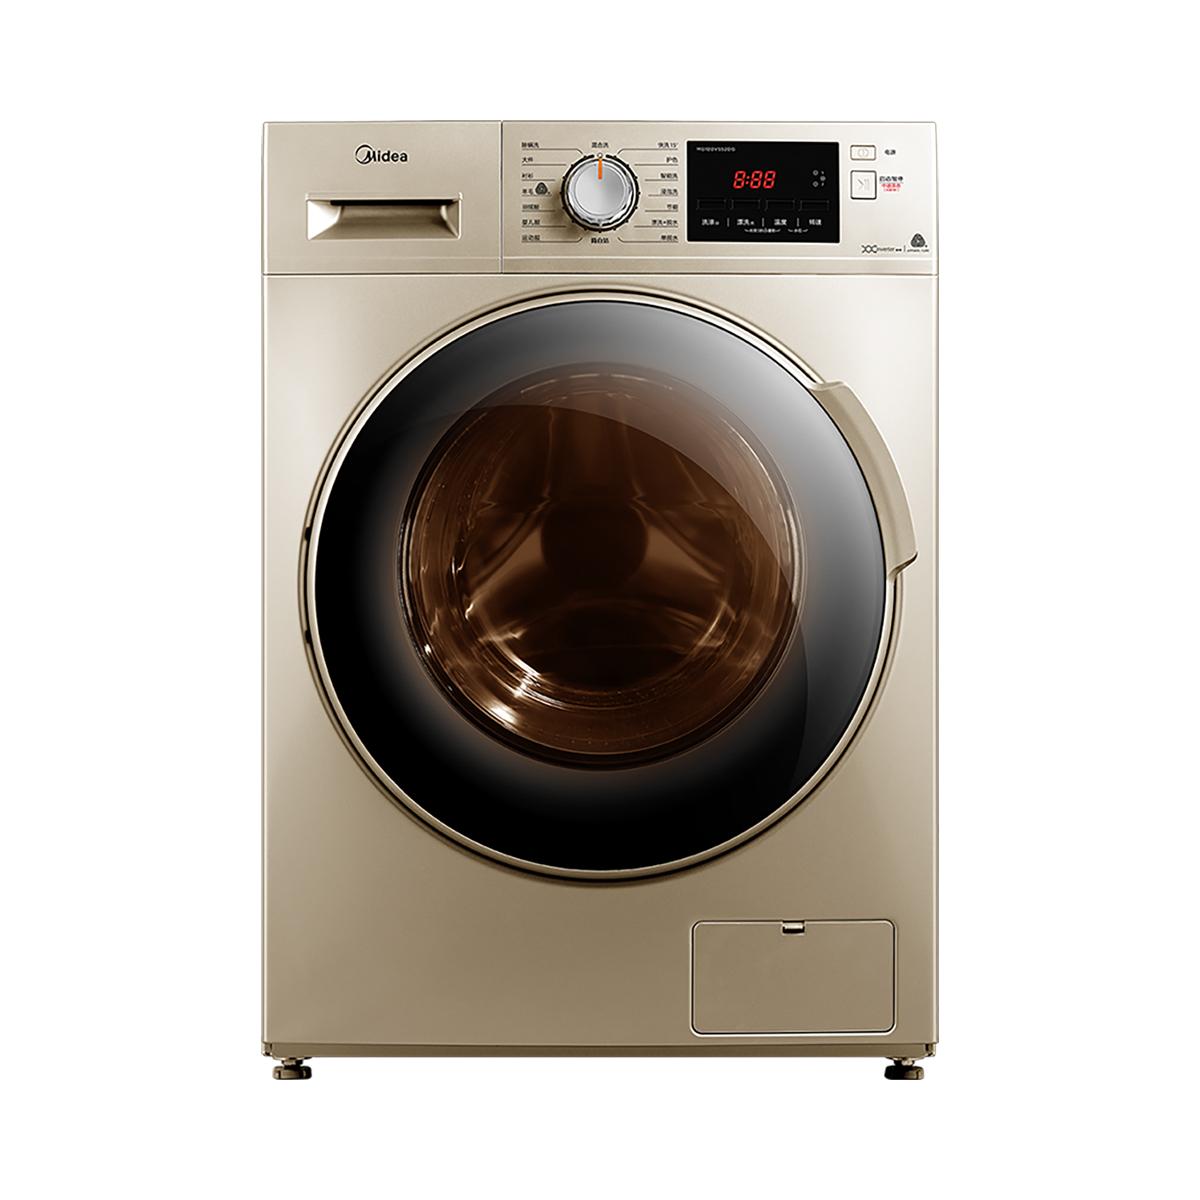 Midea/美的 MG100VS52DG洗衣机 说明书.pdf